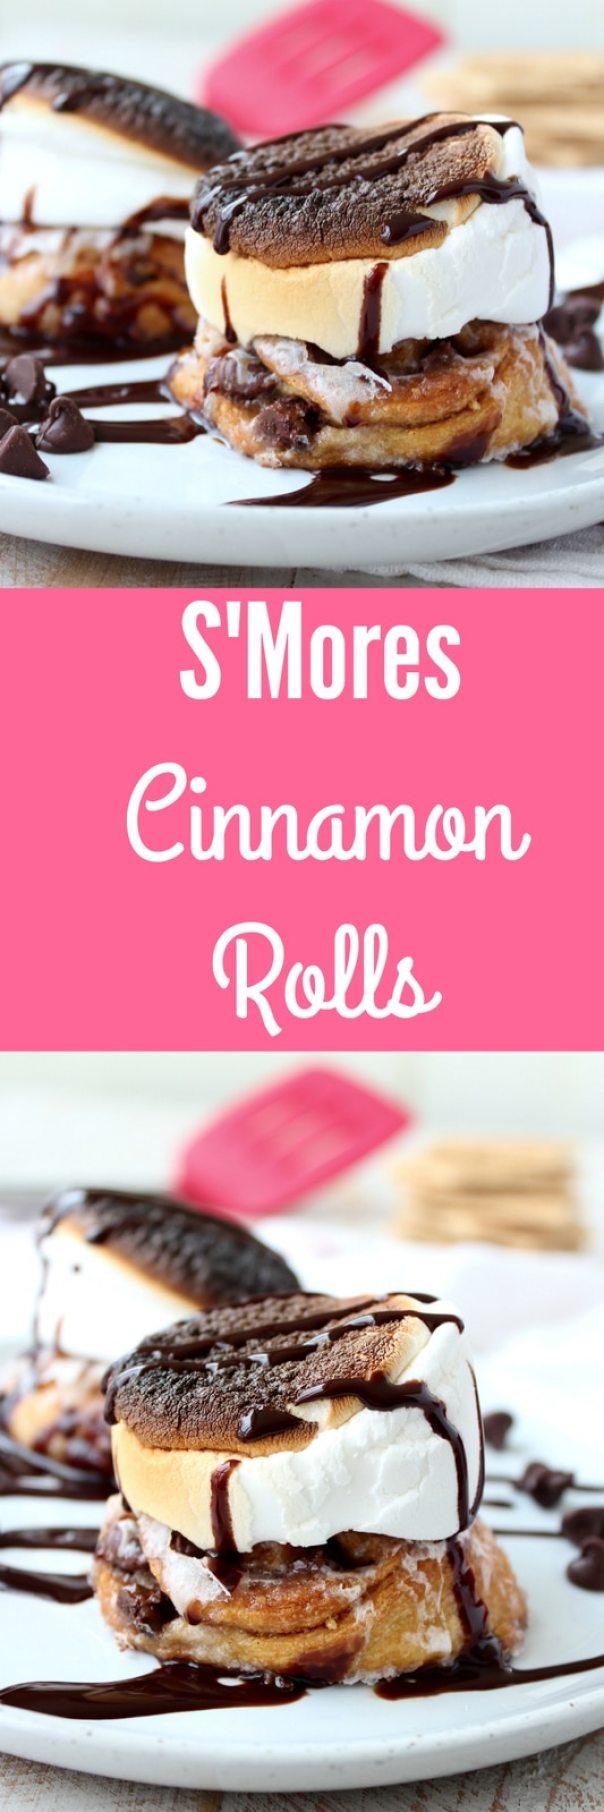 Smores Cinnamon Rolls Recipe